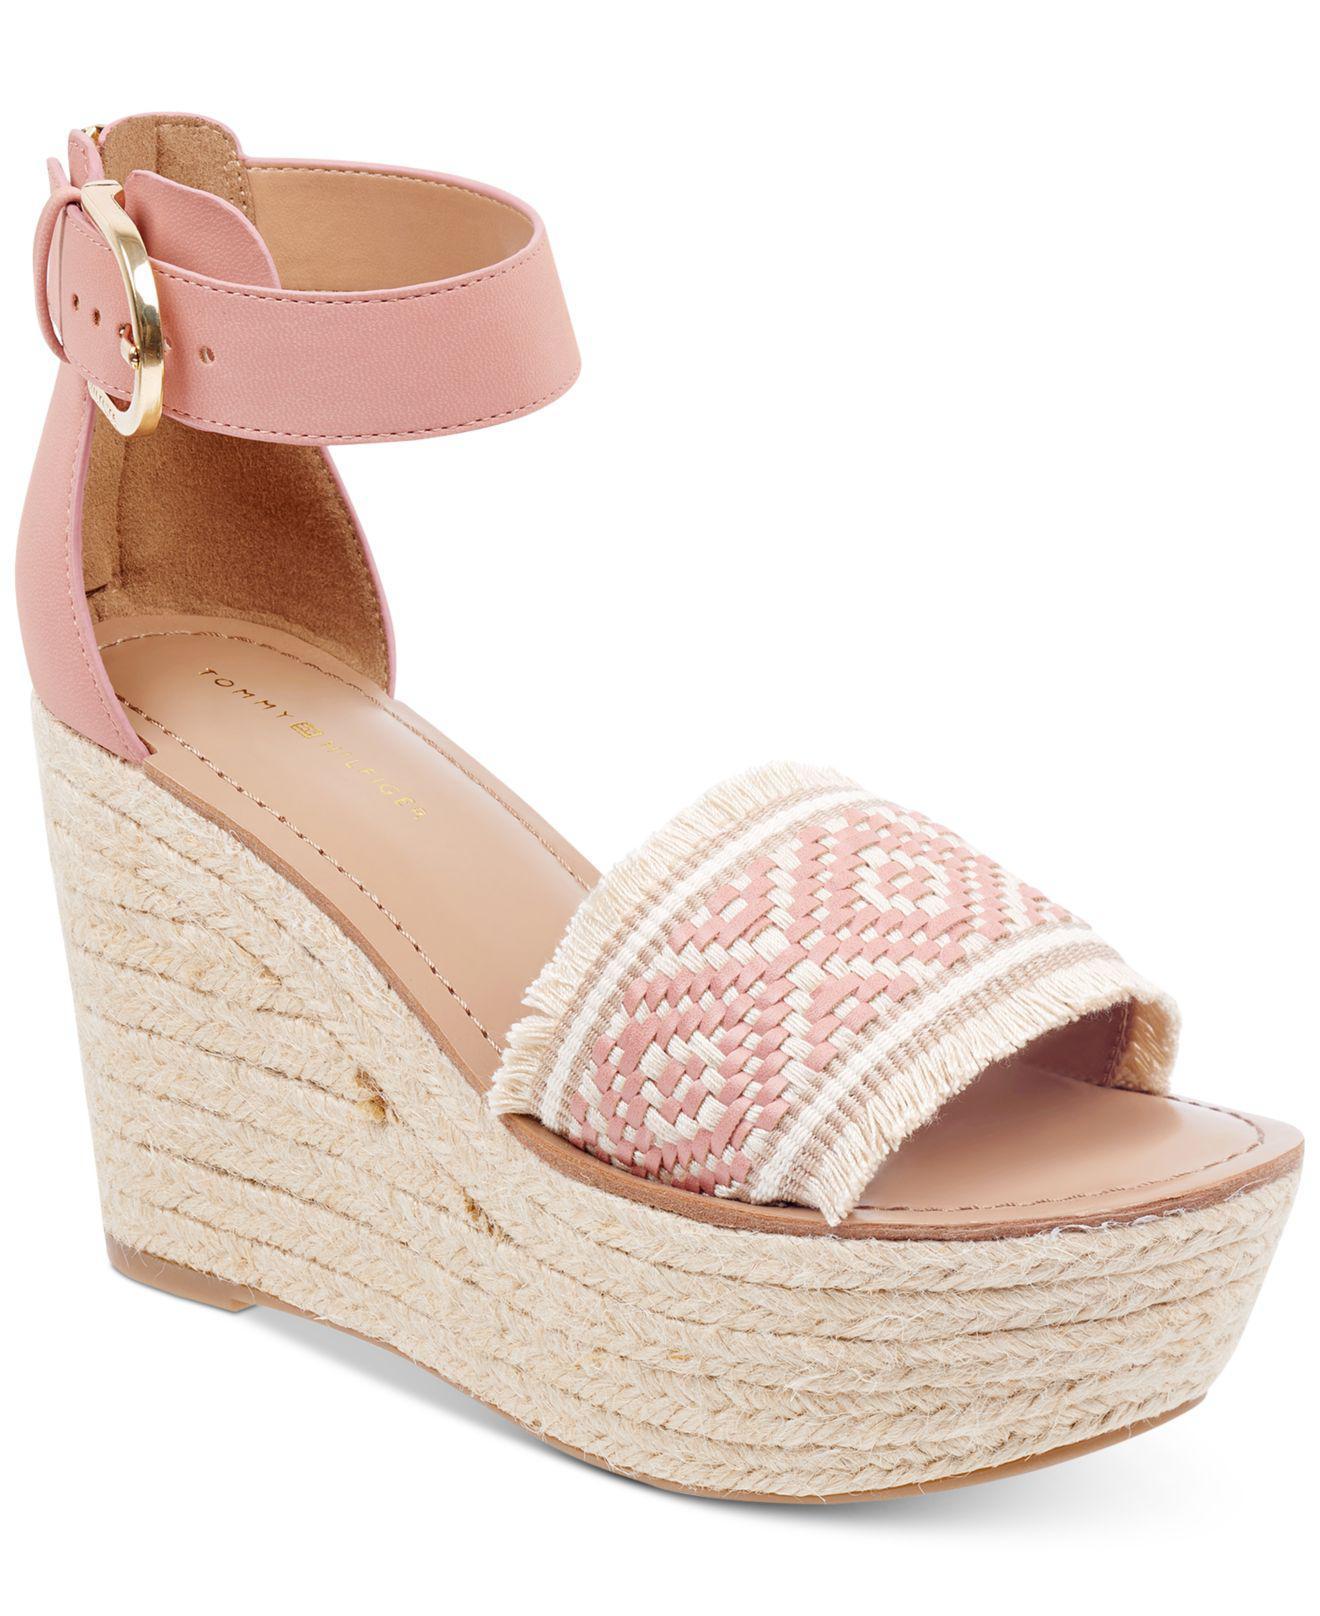 Tommy Hilfiger Yavino Espadrille Platform Wedge Sandals Women's Shoes KR4dd1K4